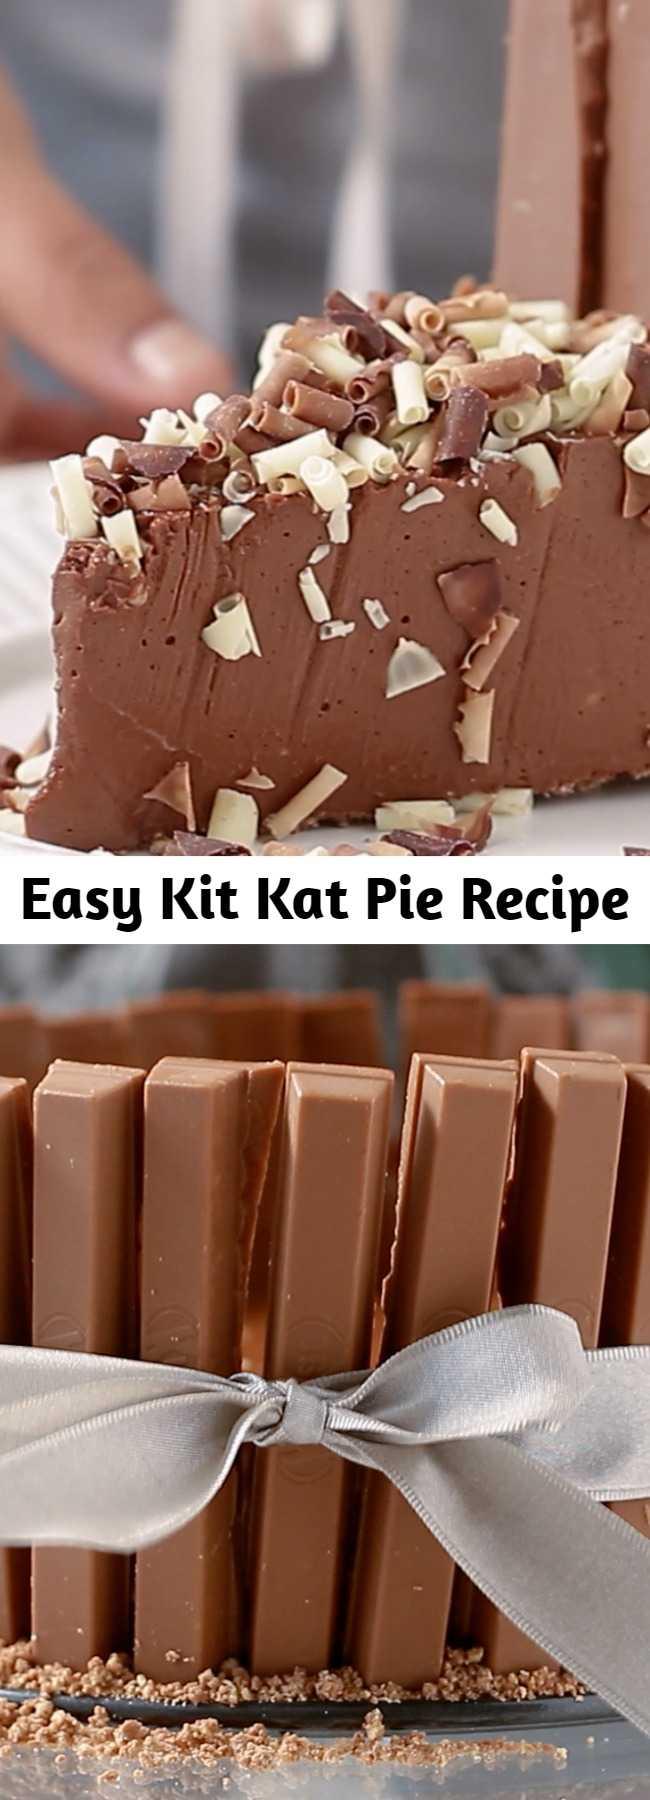 Easy Kit Kat Pie Recipe - Indulge with this creamy, chocolatey Kit Kat Pie! It will guarantee seconds. #chocolate #pie #kitkat #baking